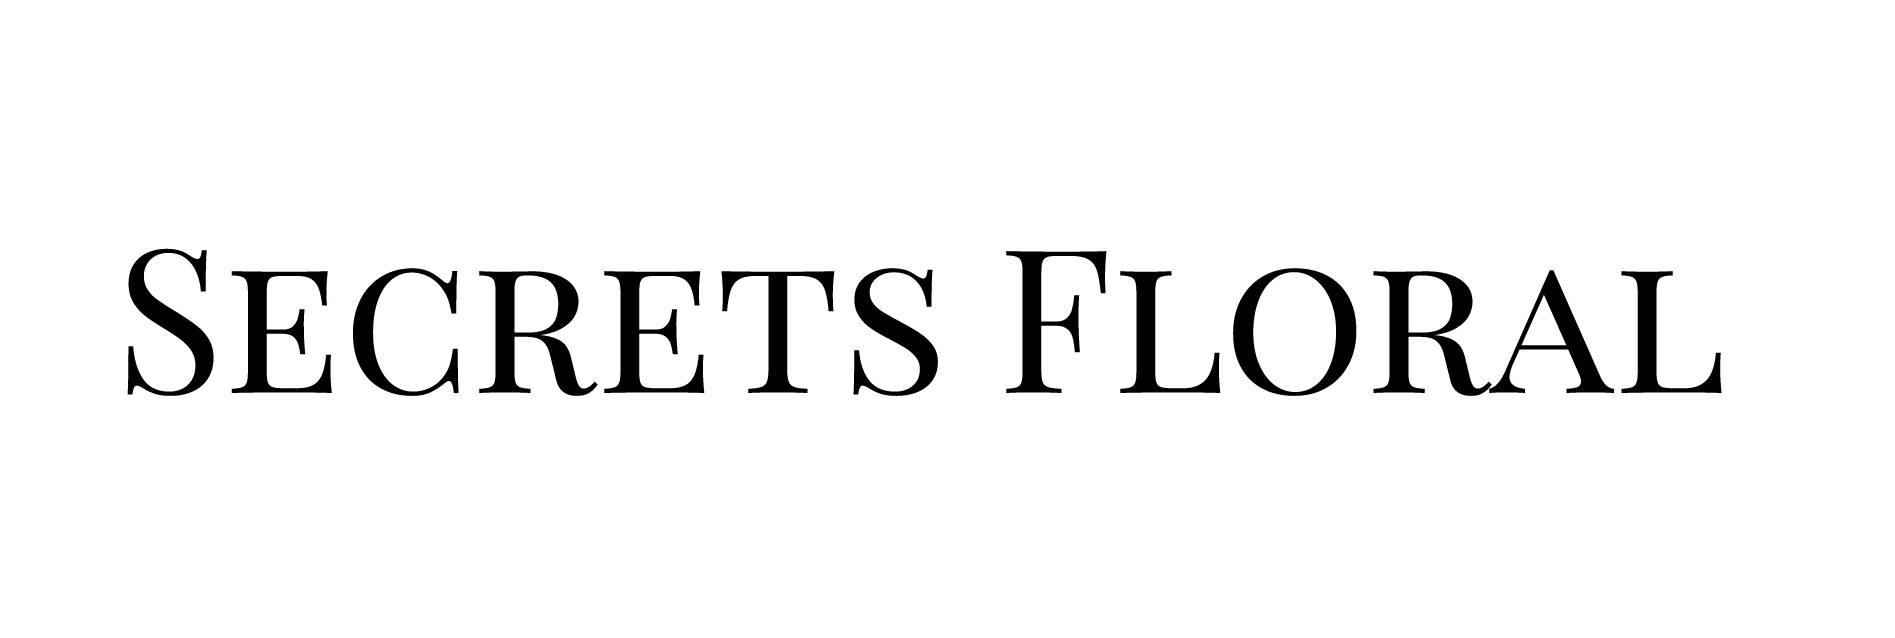 Secrets Floral.jpg